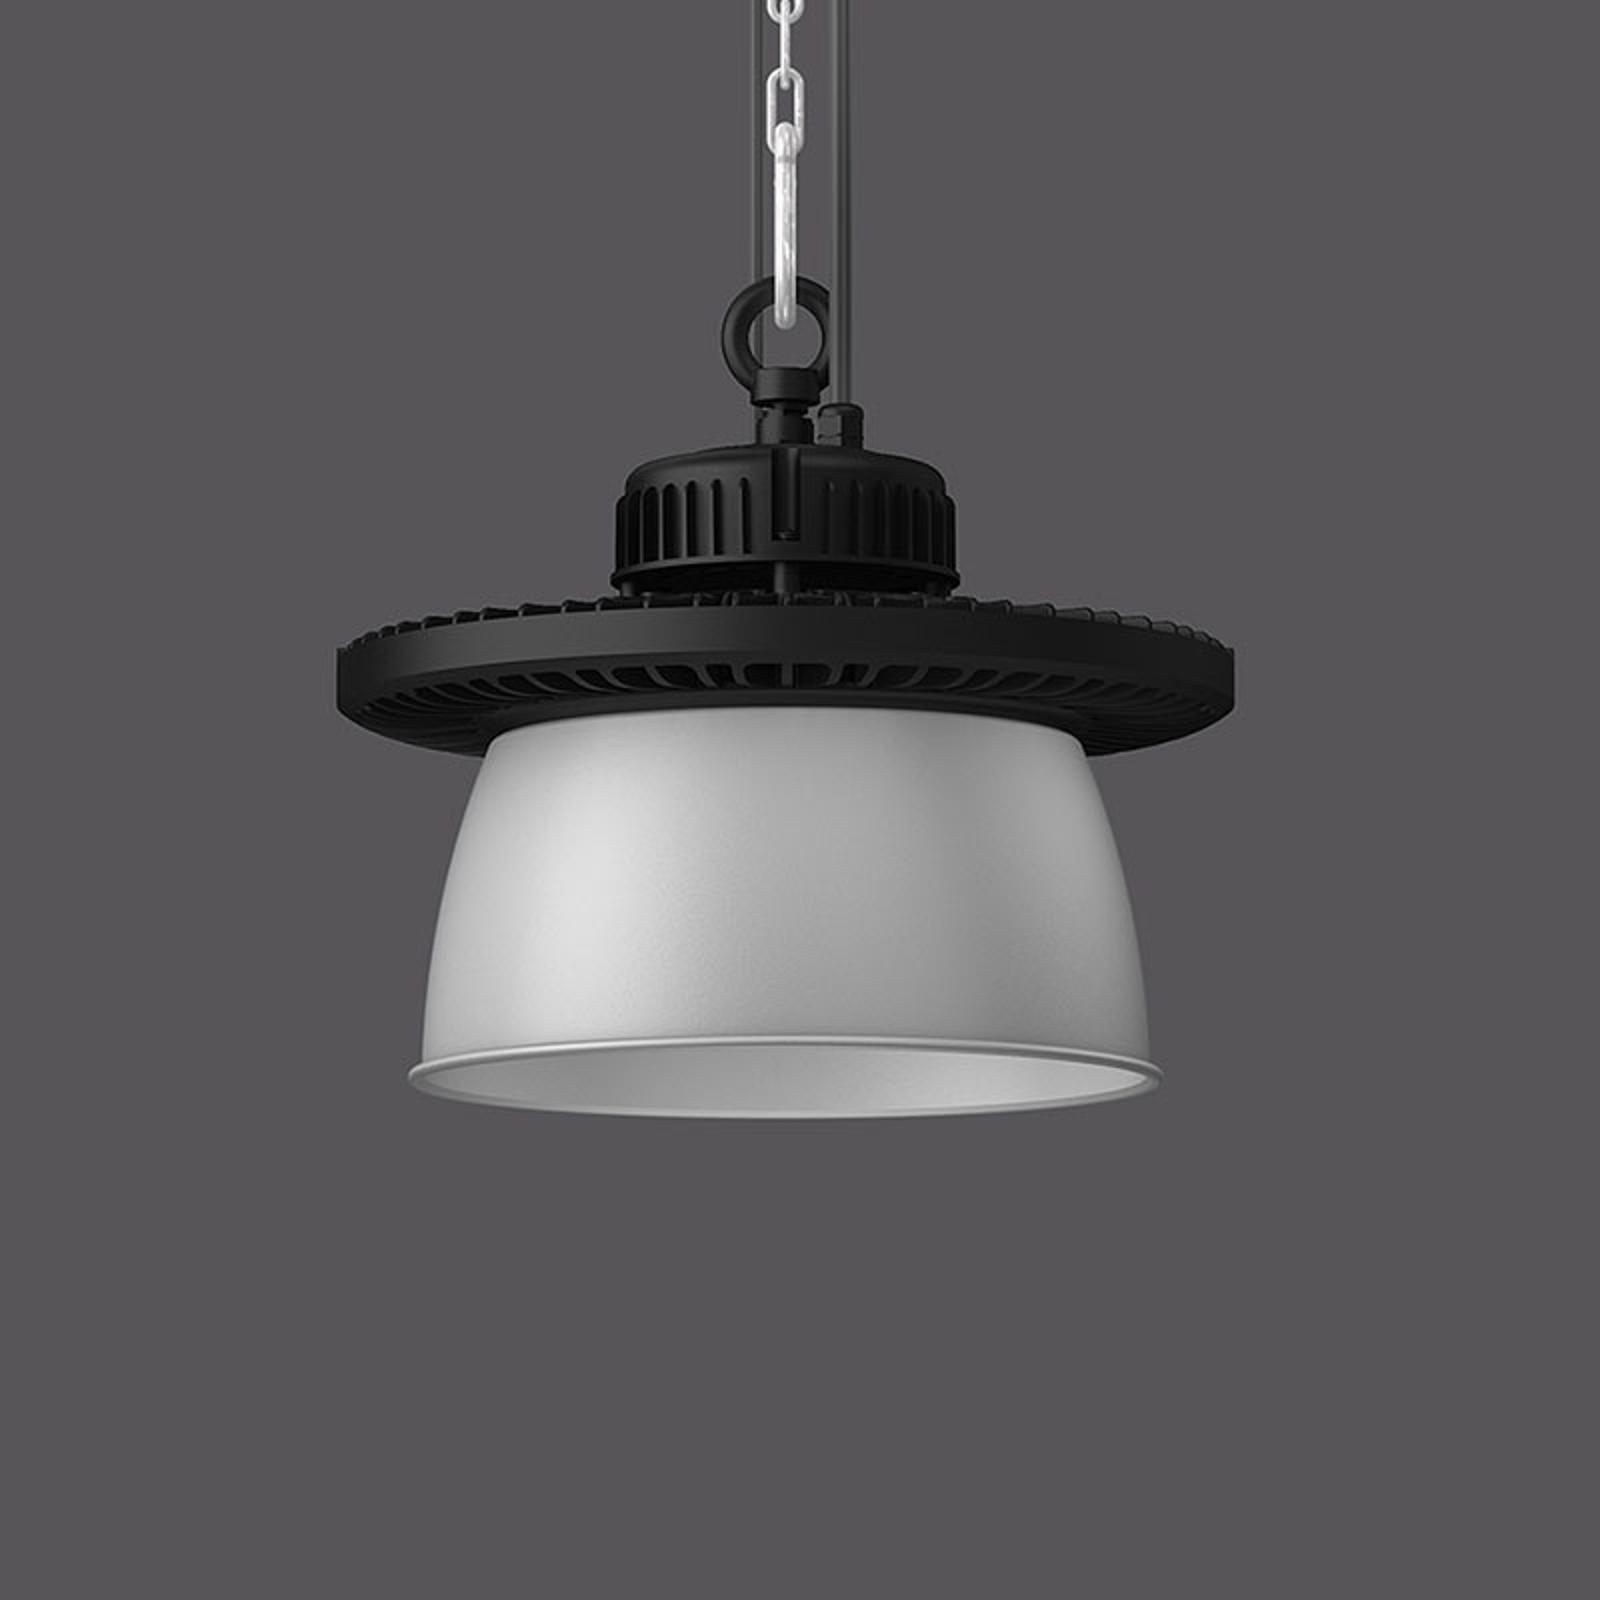 RZB Industrial Hall Midi DALI 97 W reflektor, alu